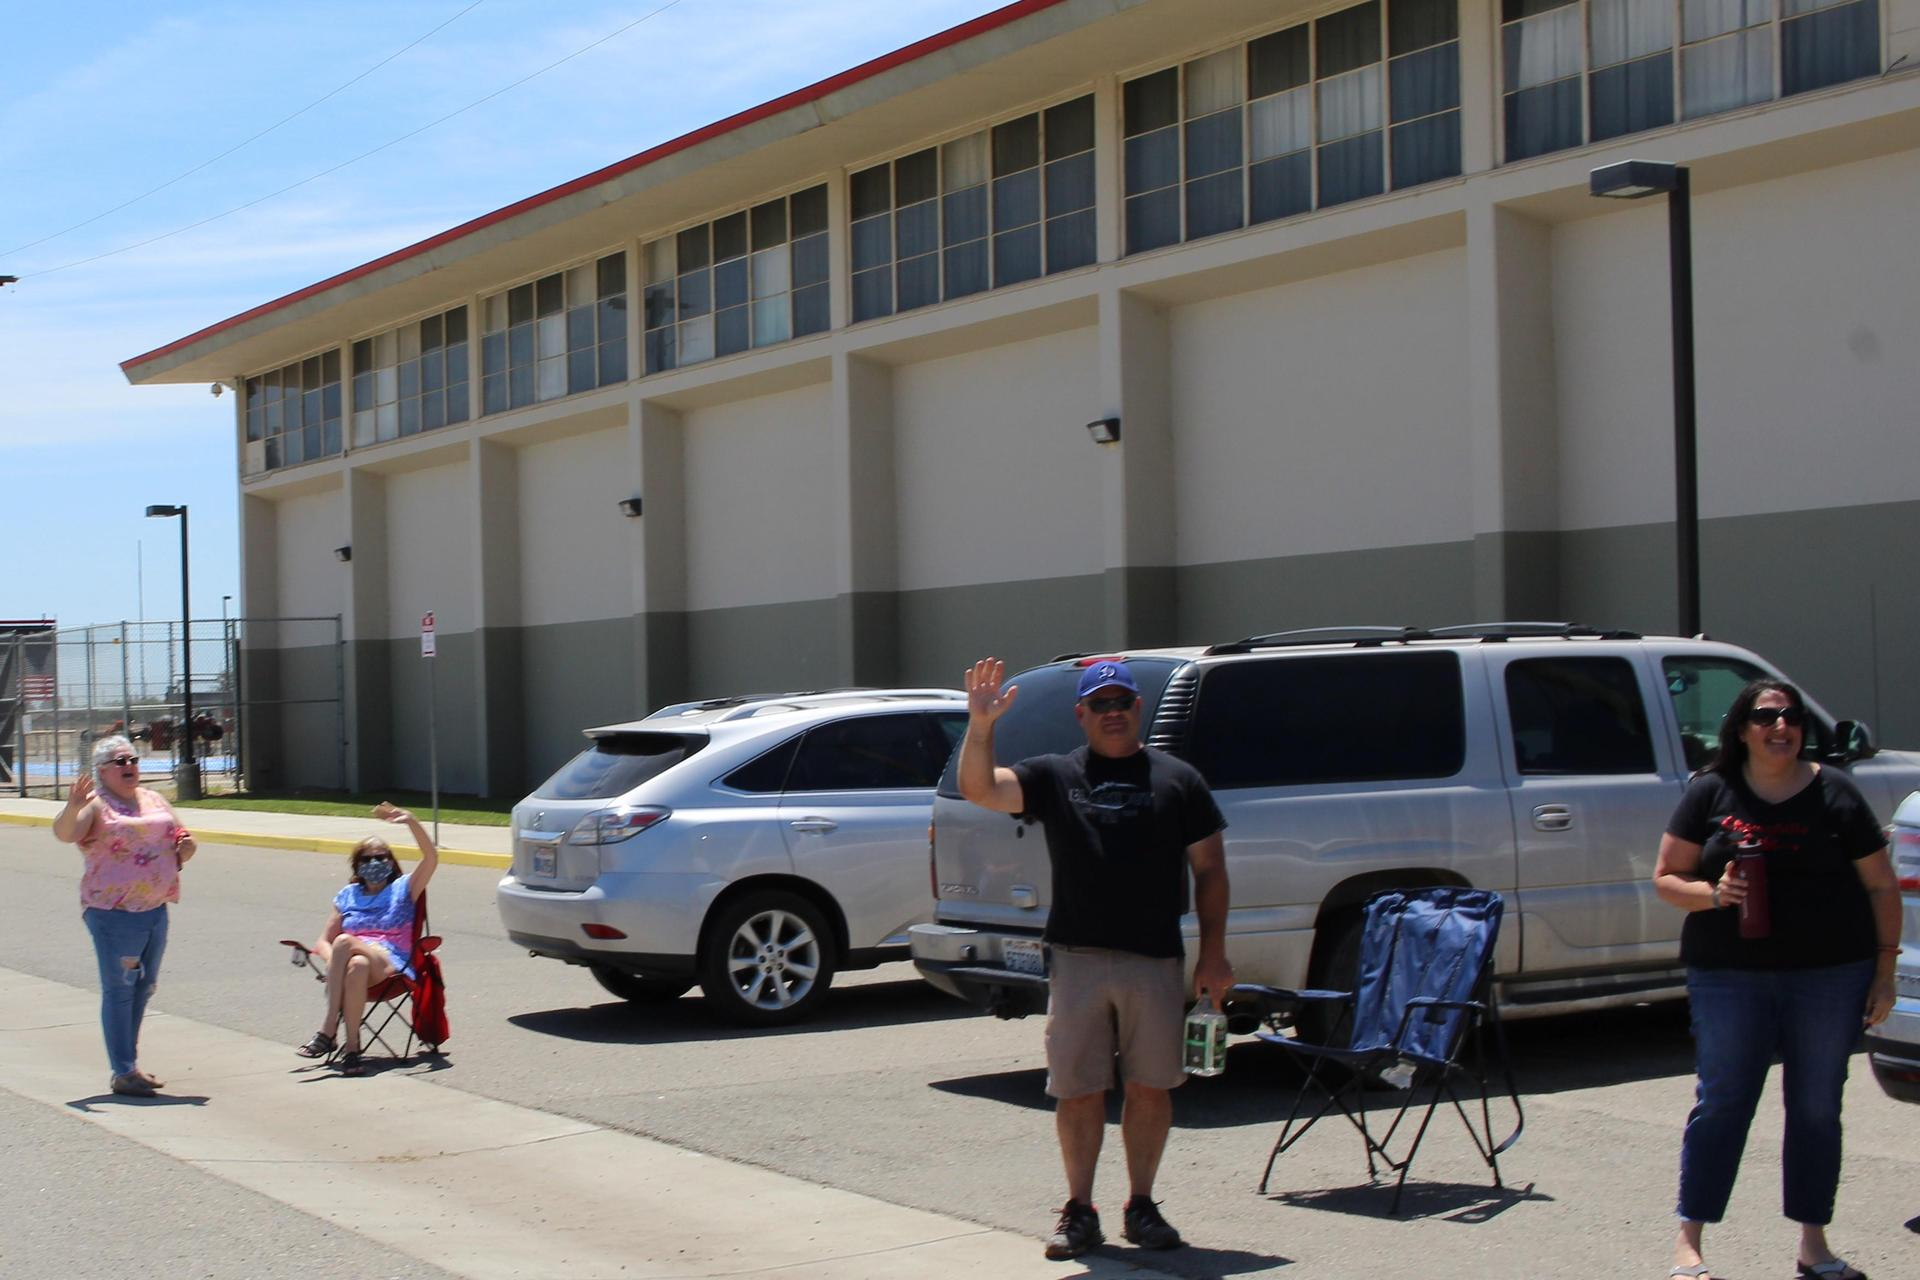 Teachers' Mary Freitas, Greta Knoublauch, John Henson, and Diana Starn waving at seniors